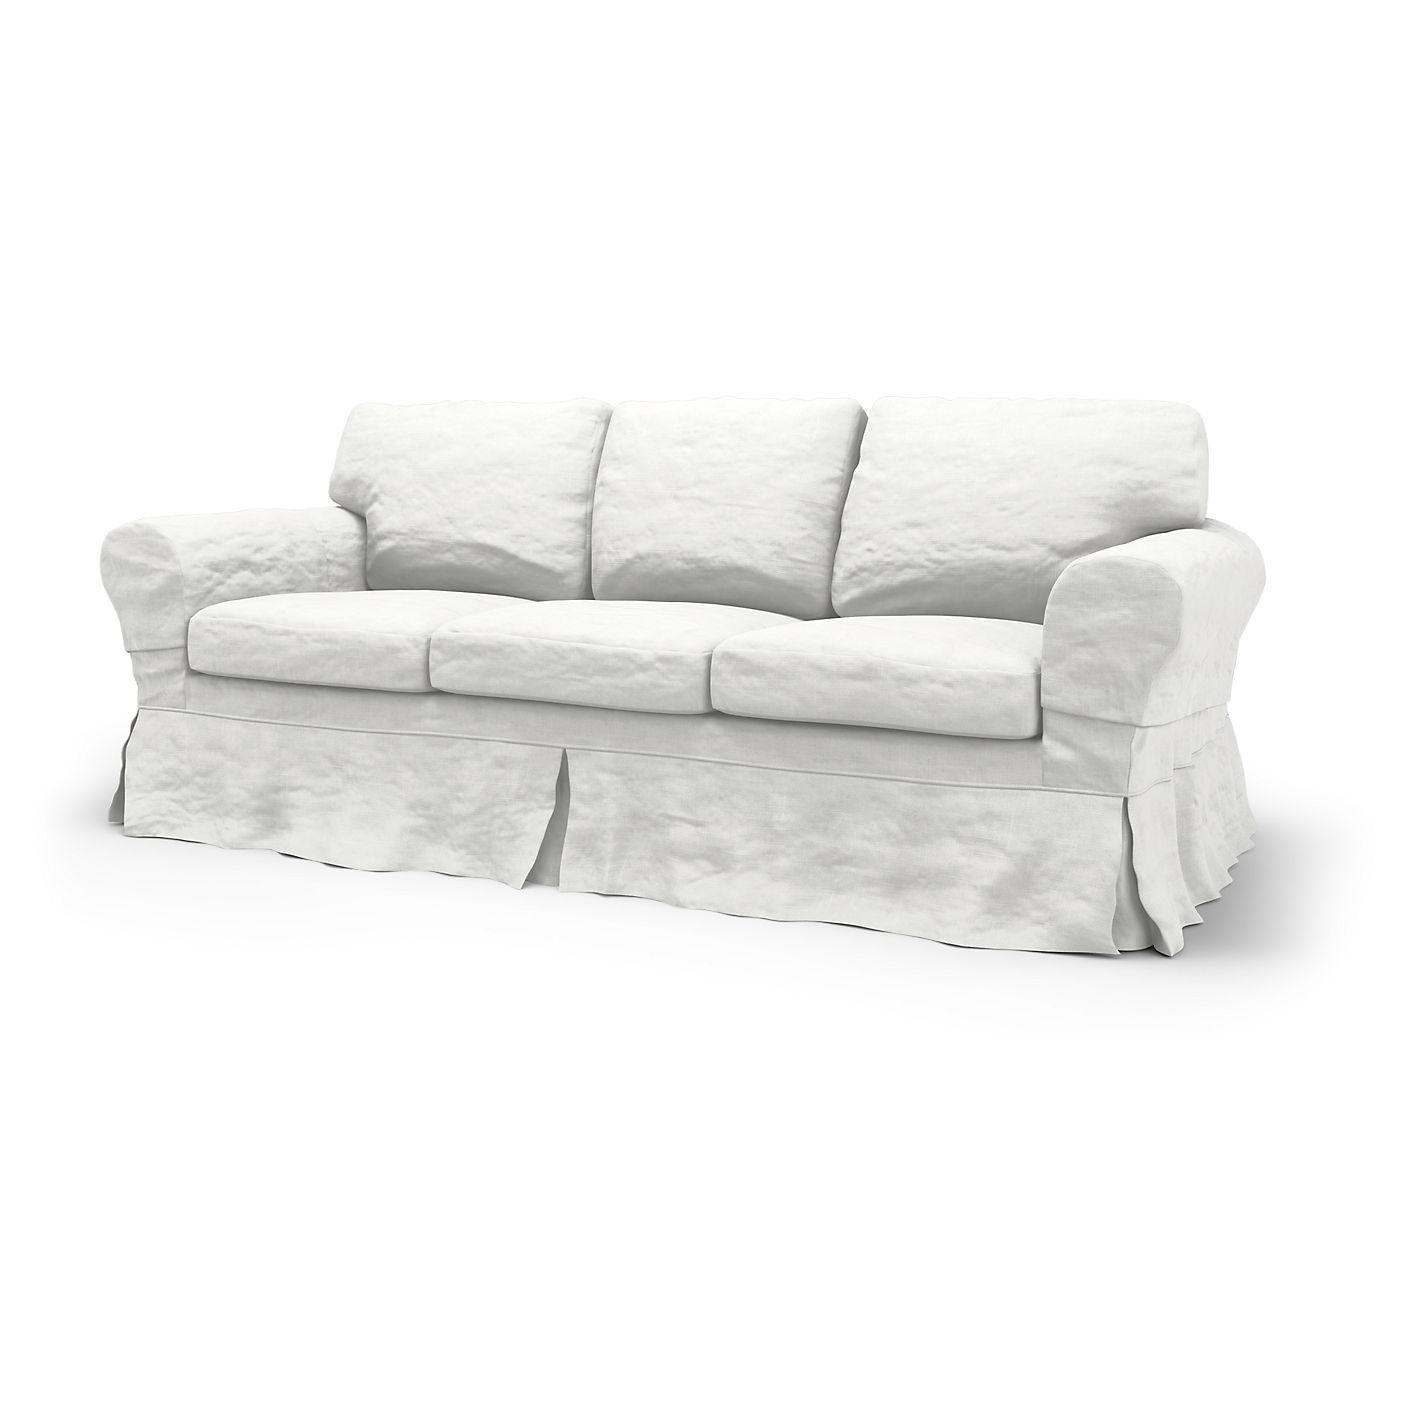 Sofa Covers Ektorp Bemz Sofa Covers Ikea Sofa Bed Ikea Sofa